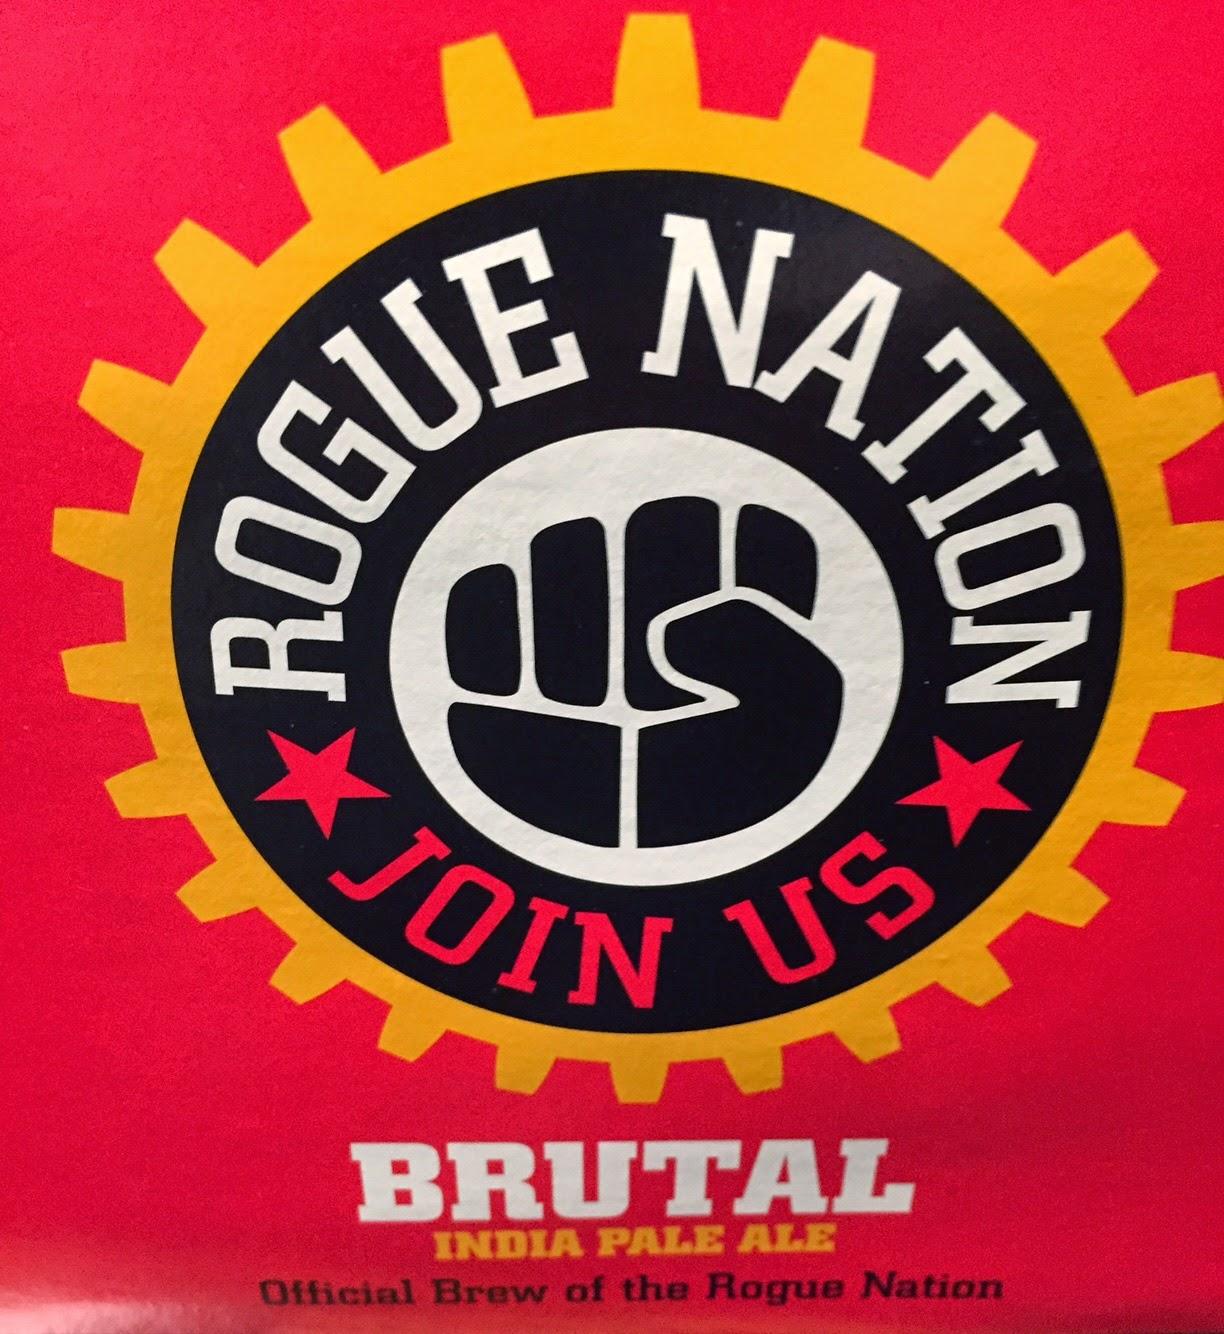 rogue brutal - Copy.jpg